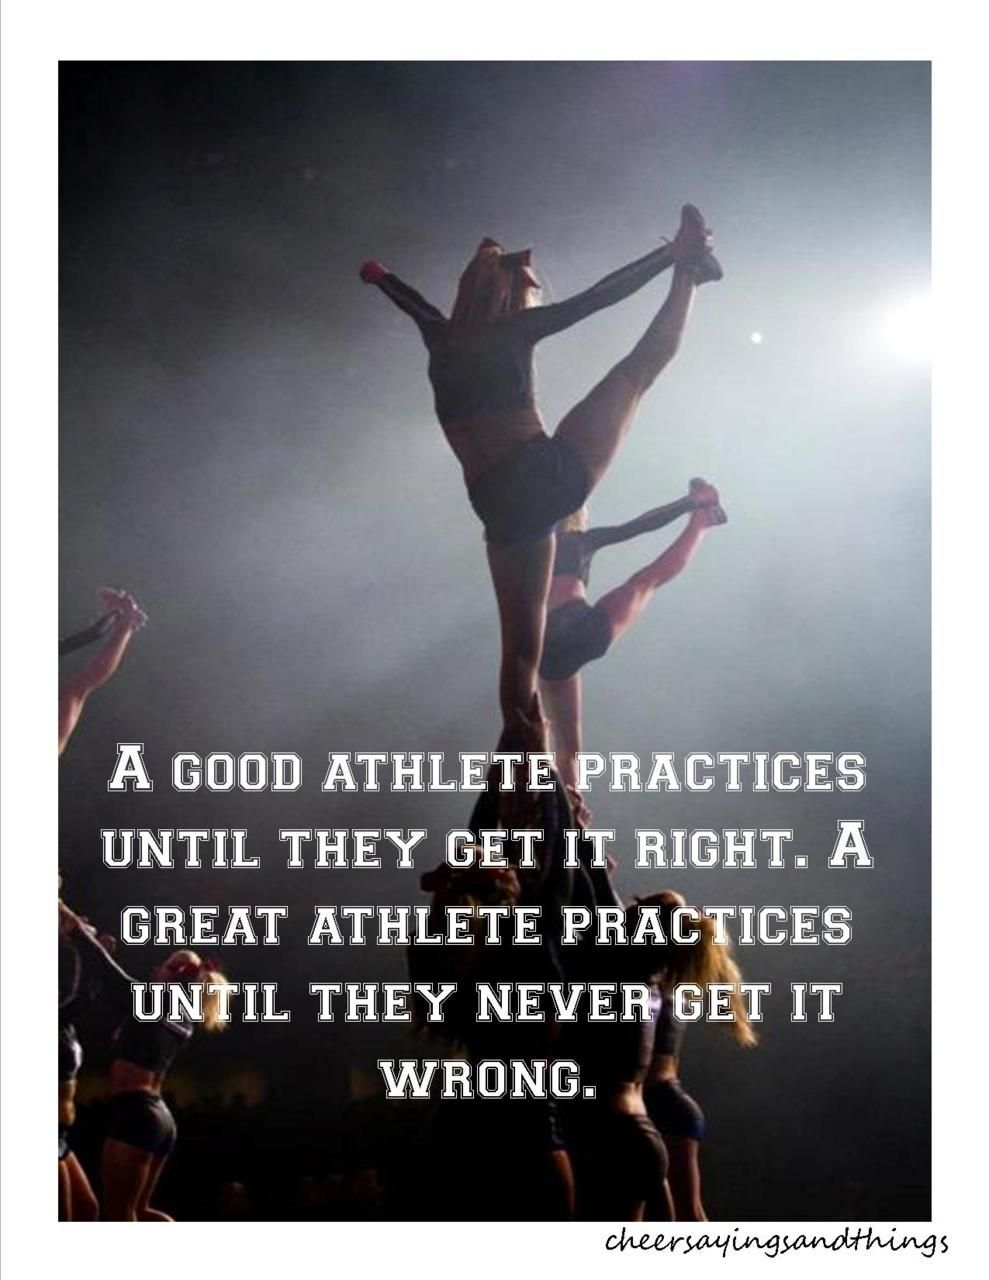 Cheerleading Quotes Tumblr Cheer Sayings & Things